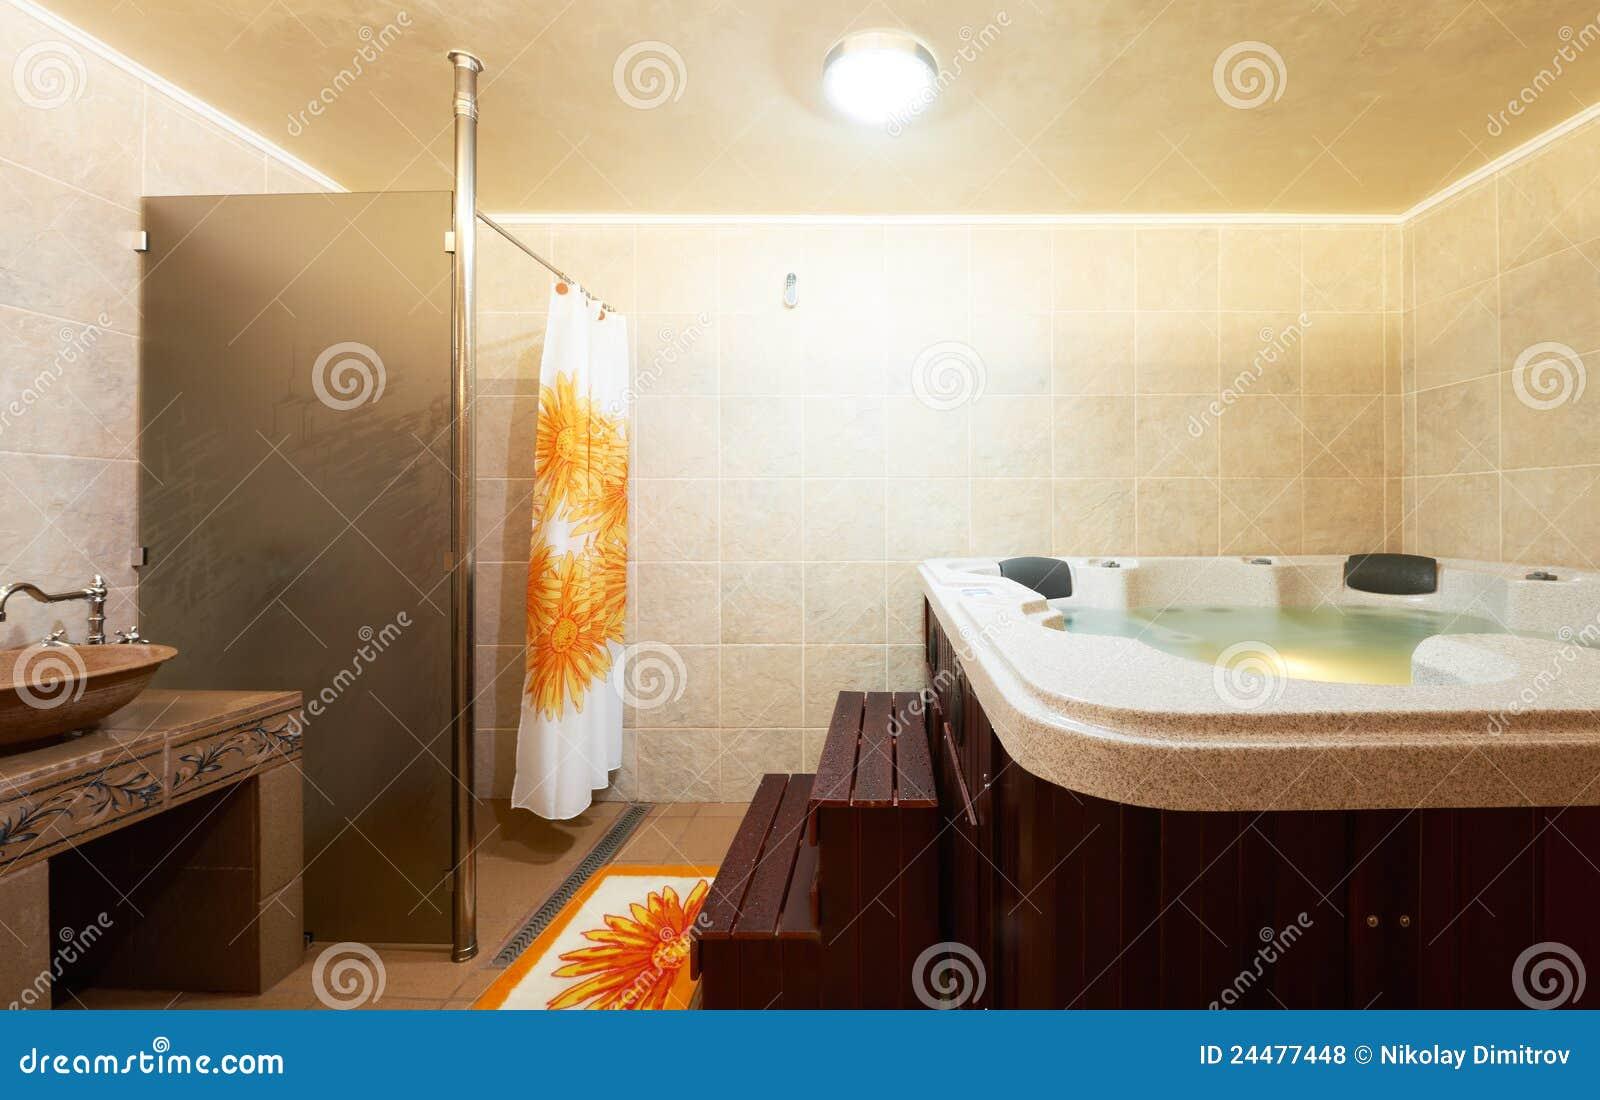 Vasca Da Bagno Misure Minime : Vasca da bagno dimensioni minime. affordable bagno disabili